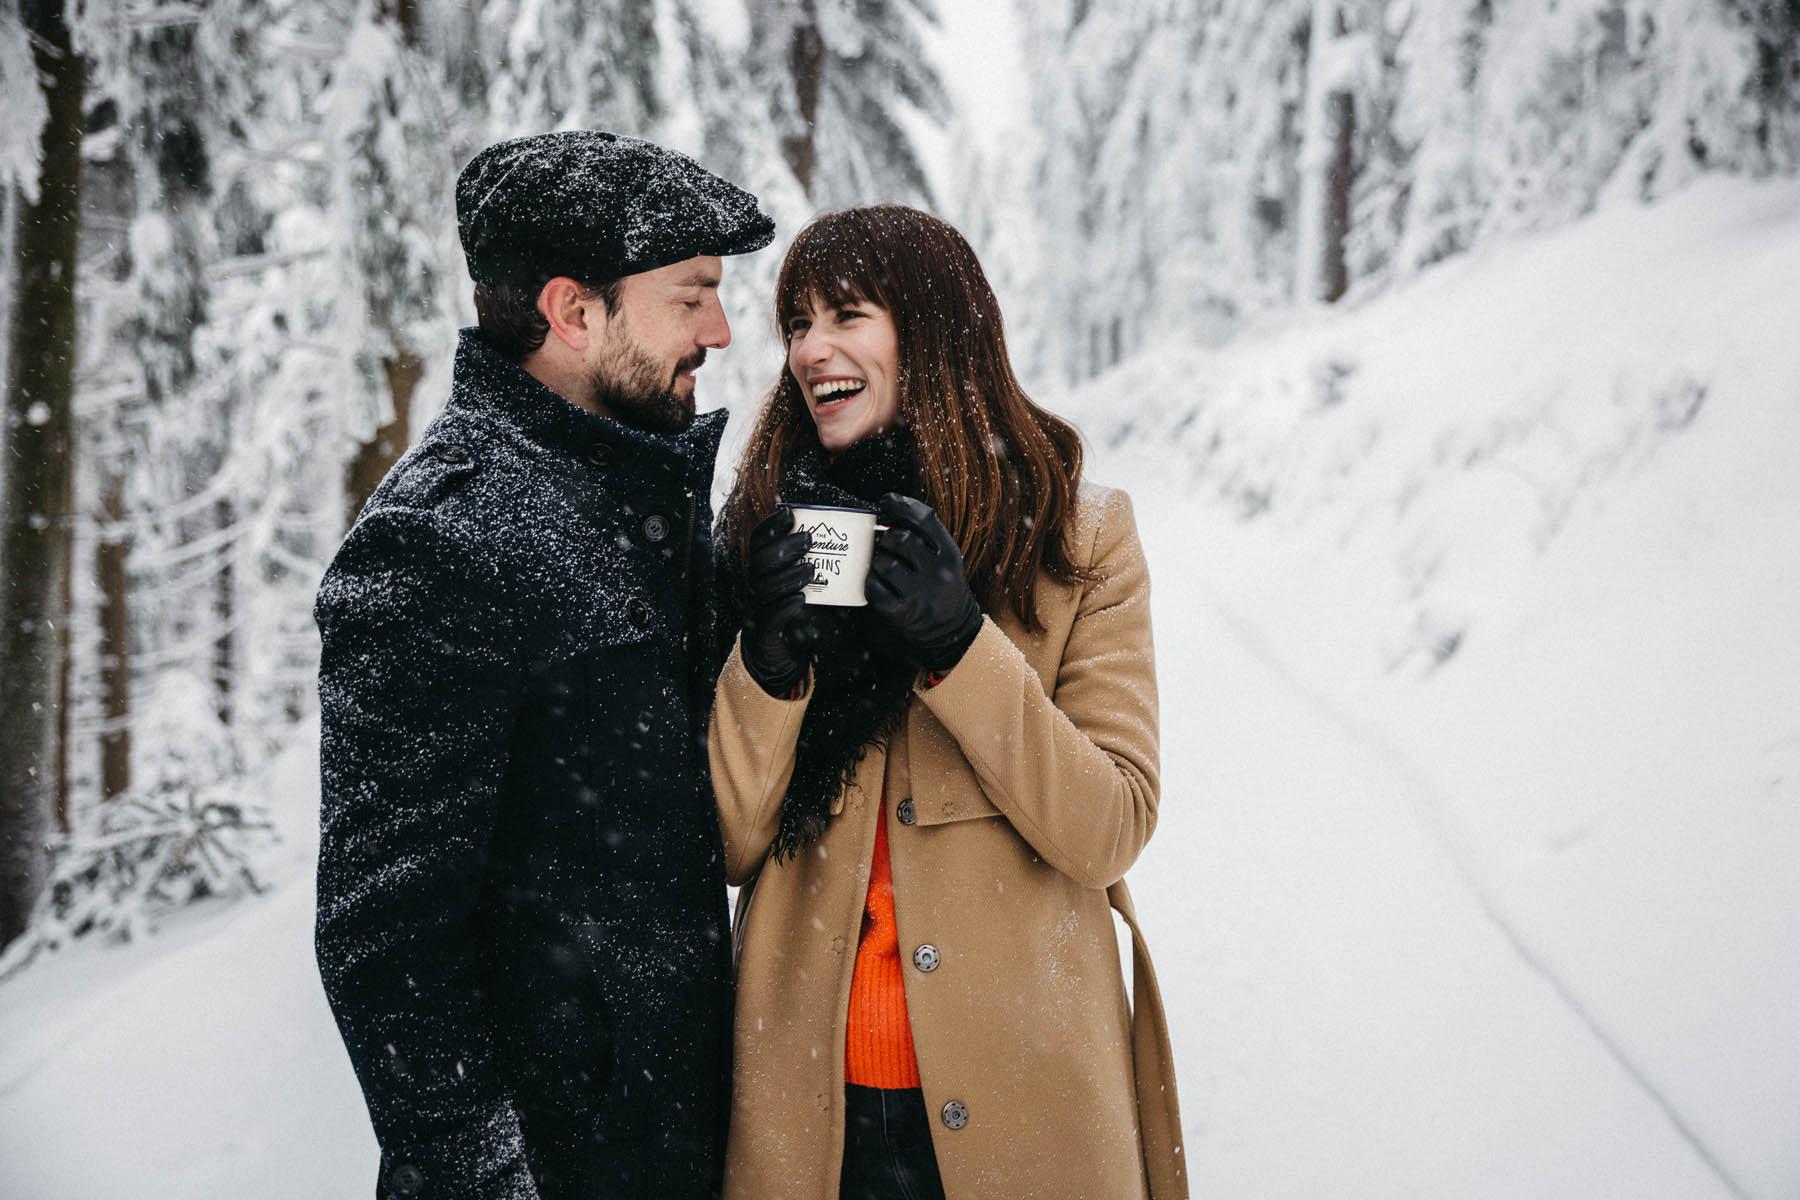 raissa simon fotografie paarshooting nais andre winter schwarzwaldhochstrasse 03 - Naïs + André